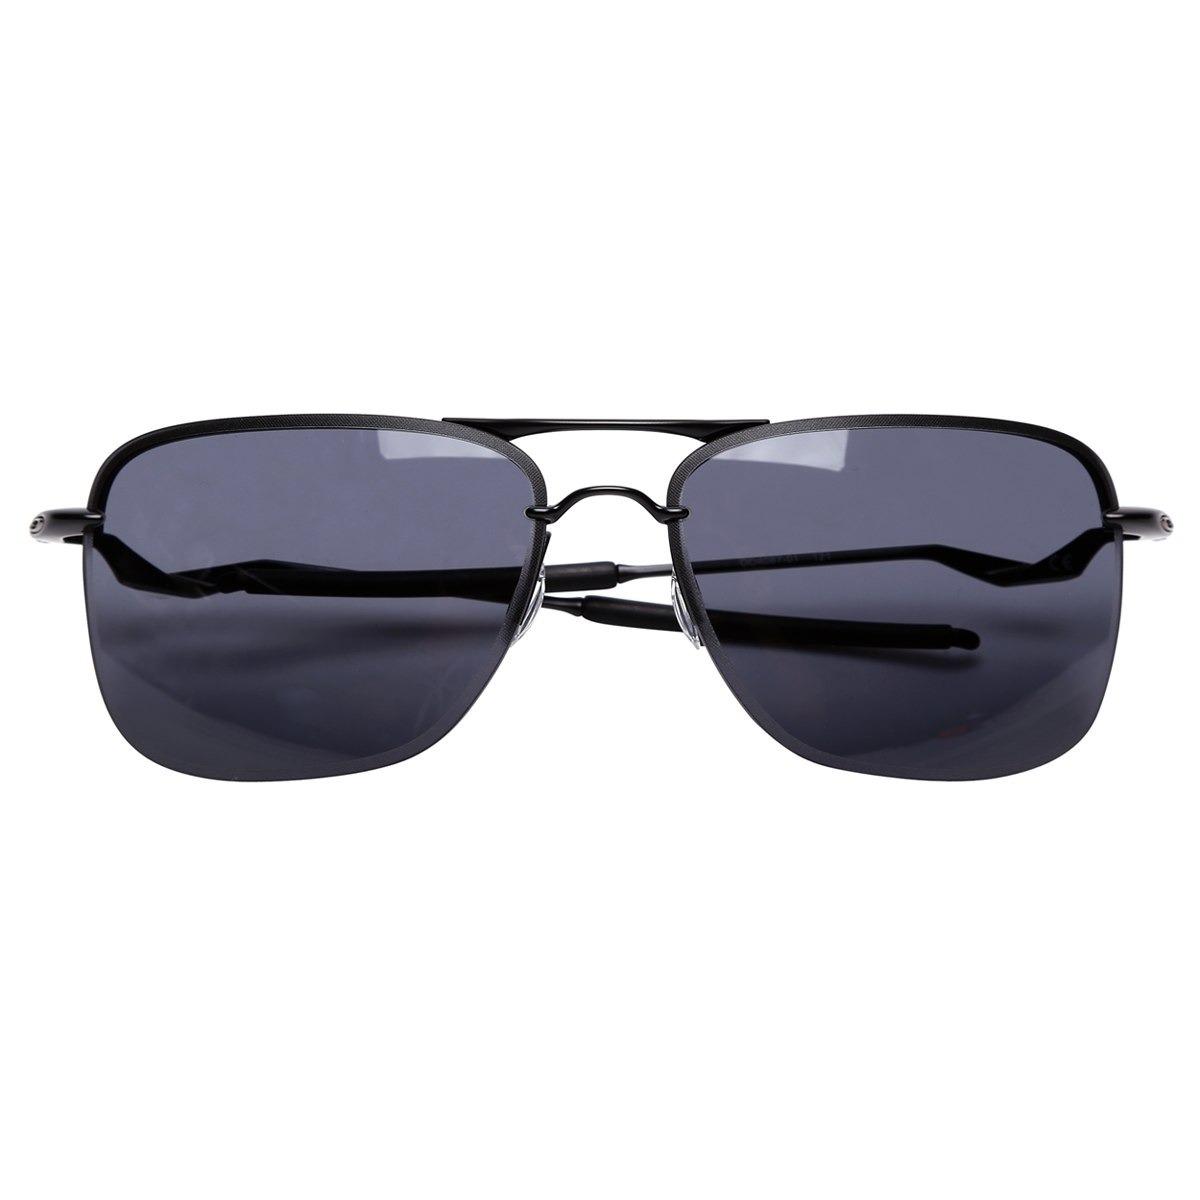 Óculos Oakley Tailhook Satin-oo4087 - R  599,00 em Mercado Livre d73e556a31